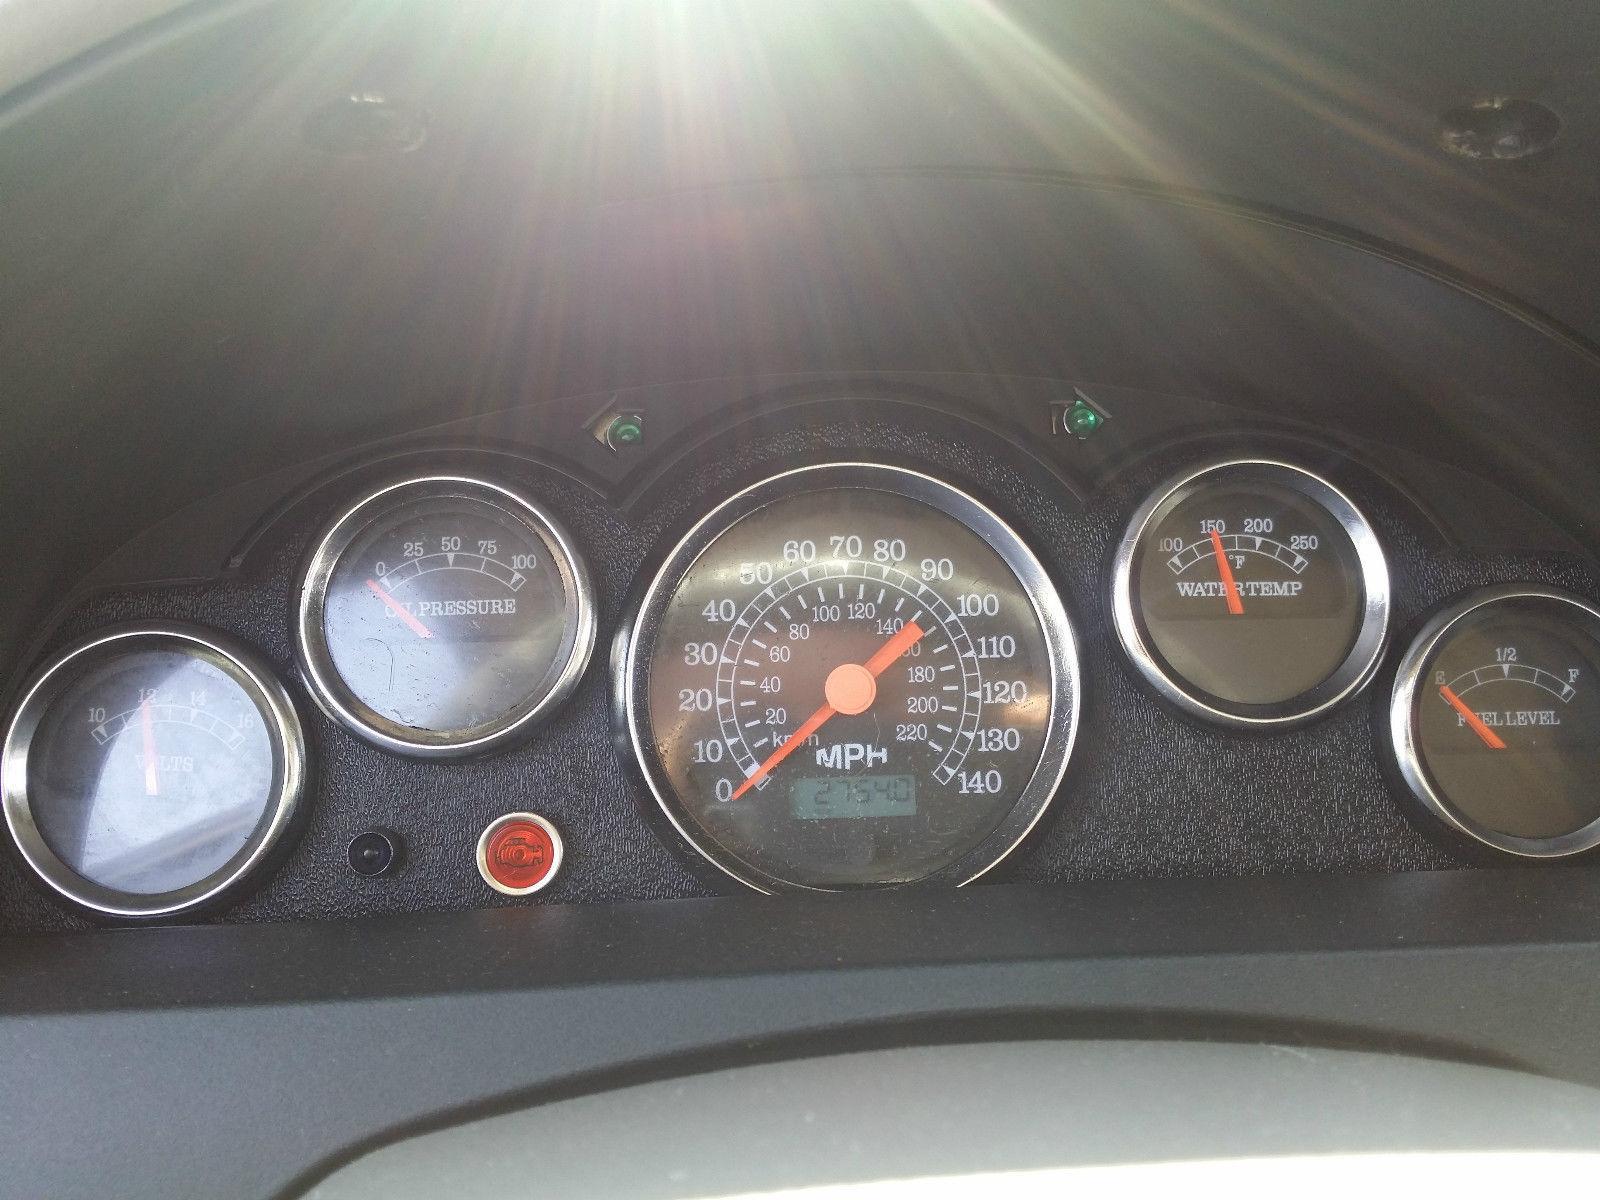 KIA Sorento 600 HP